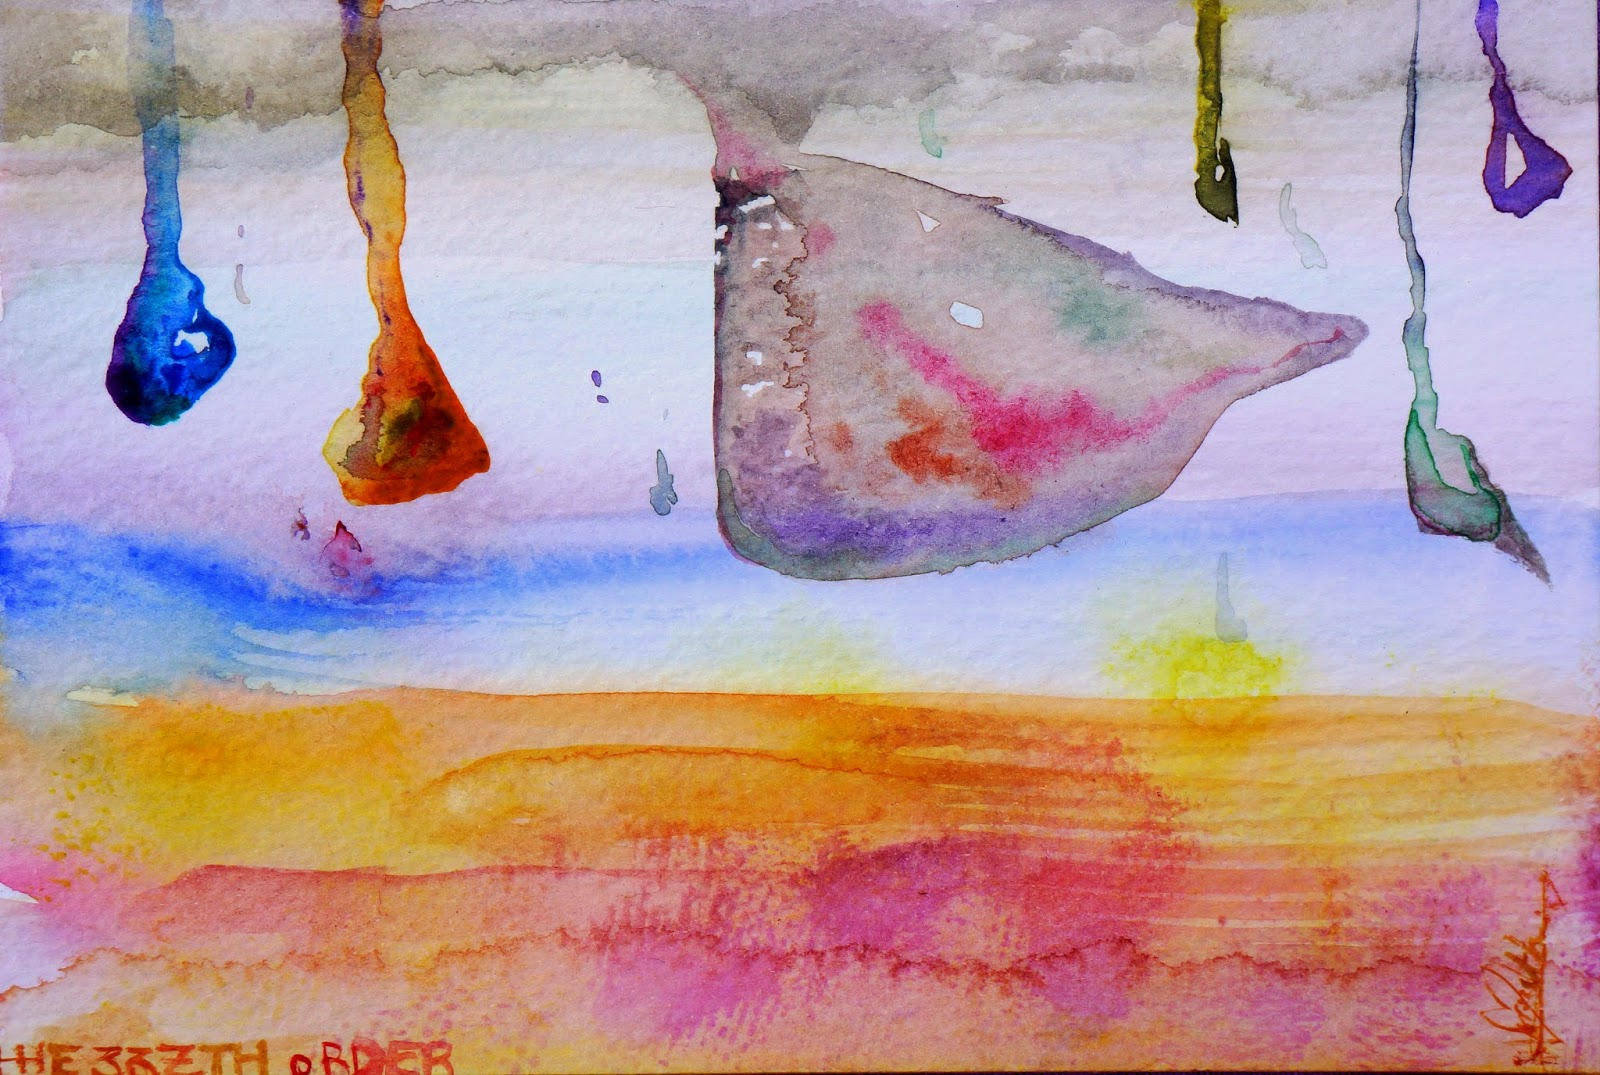 POSTCARD: Spilling life. Elizabeth Casua